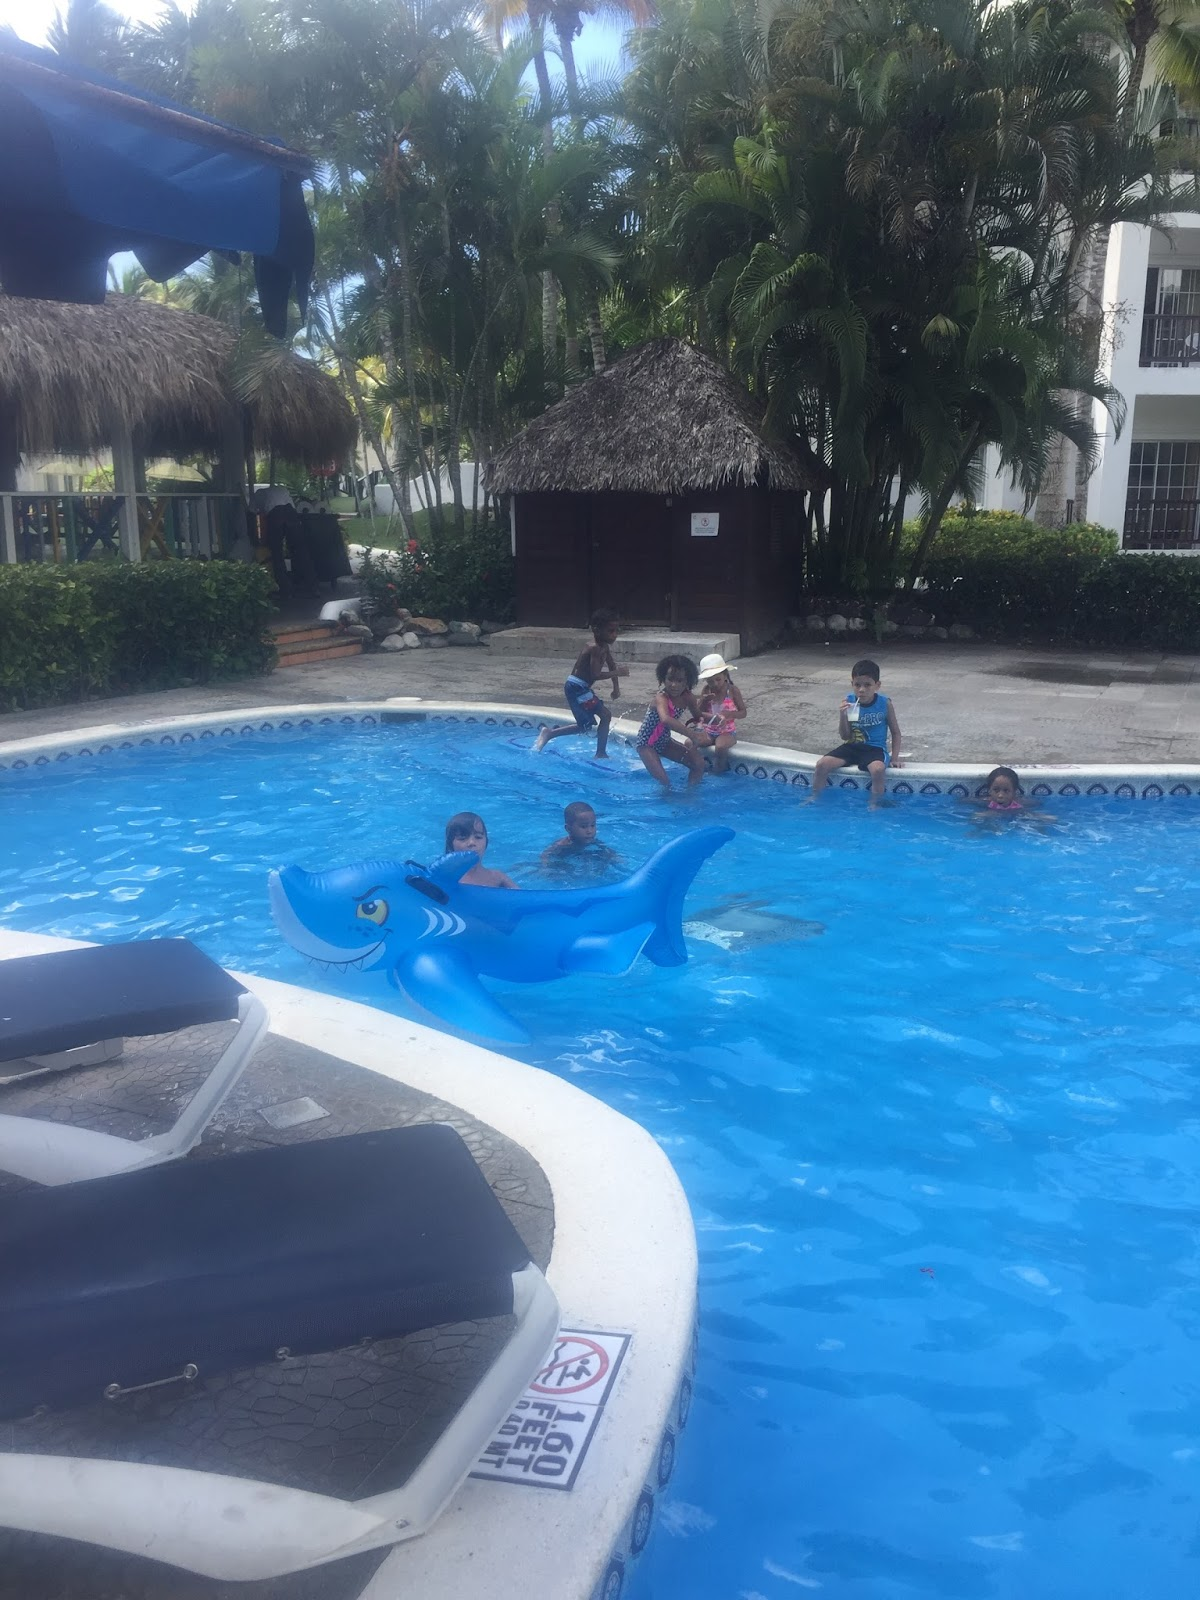 BOCA CHICA REPUBLICA DOMINICANA